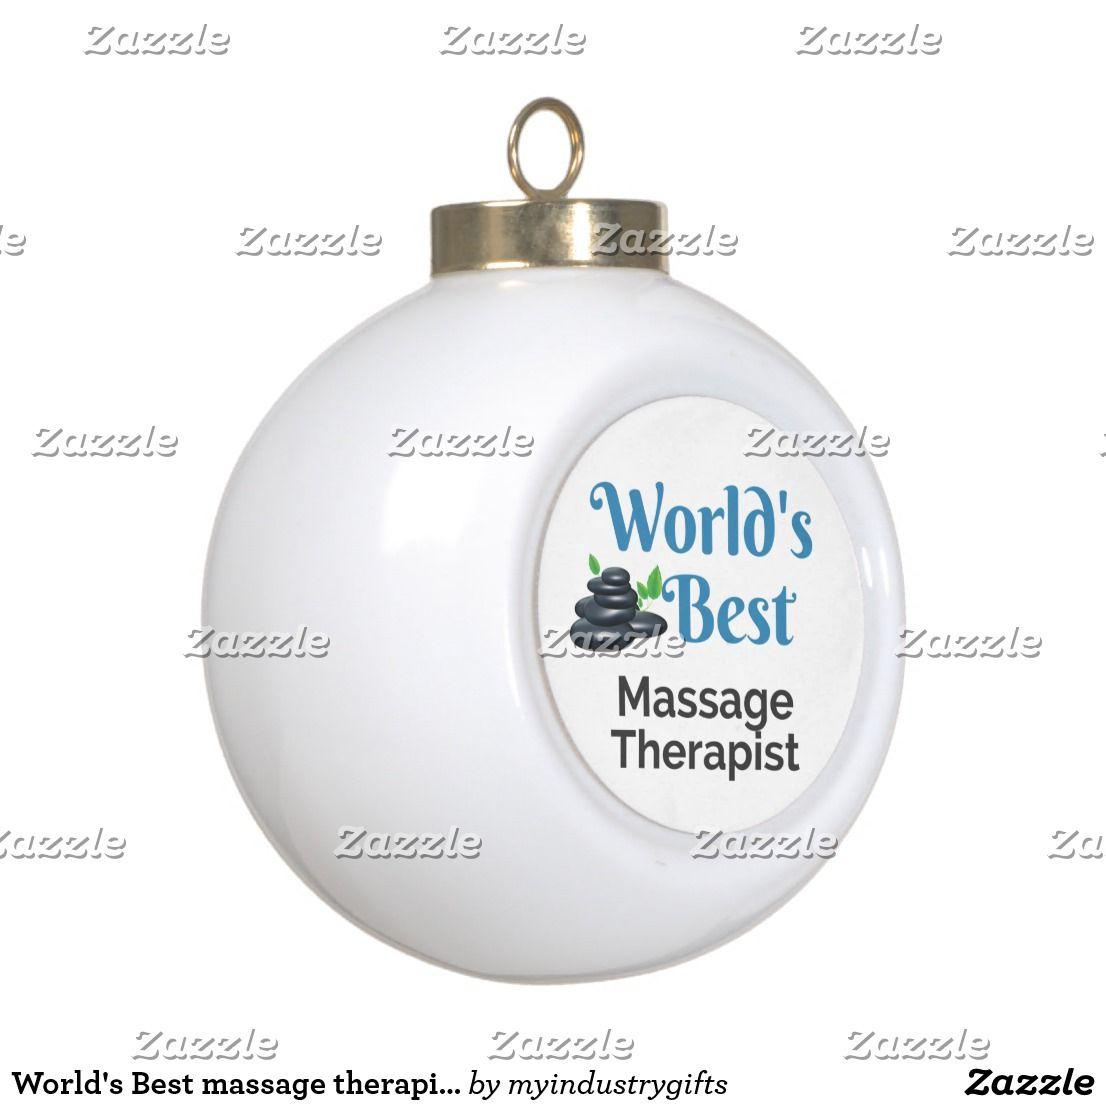 Park Art|My WordPress Blog_Christmas Gifts For Massage Therapists